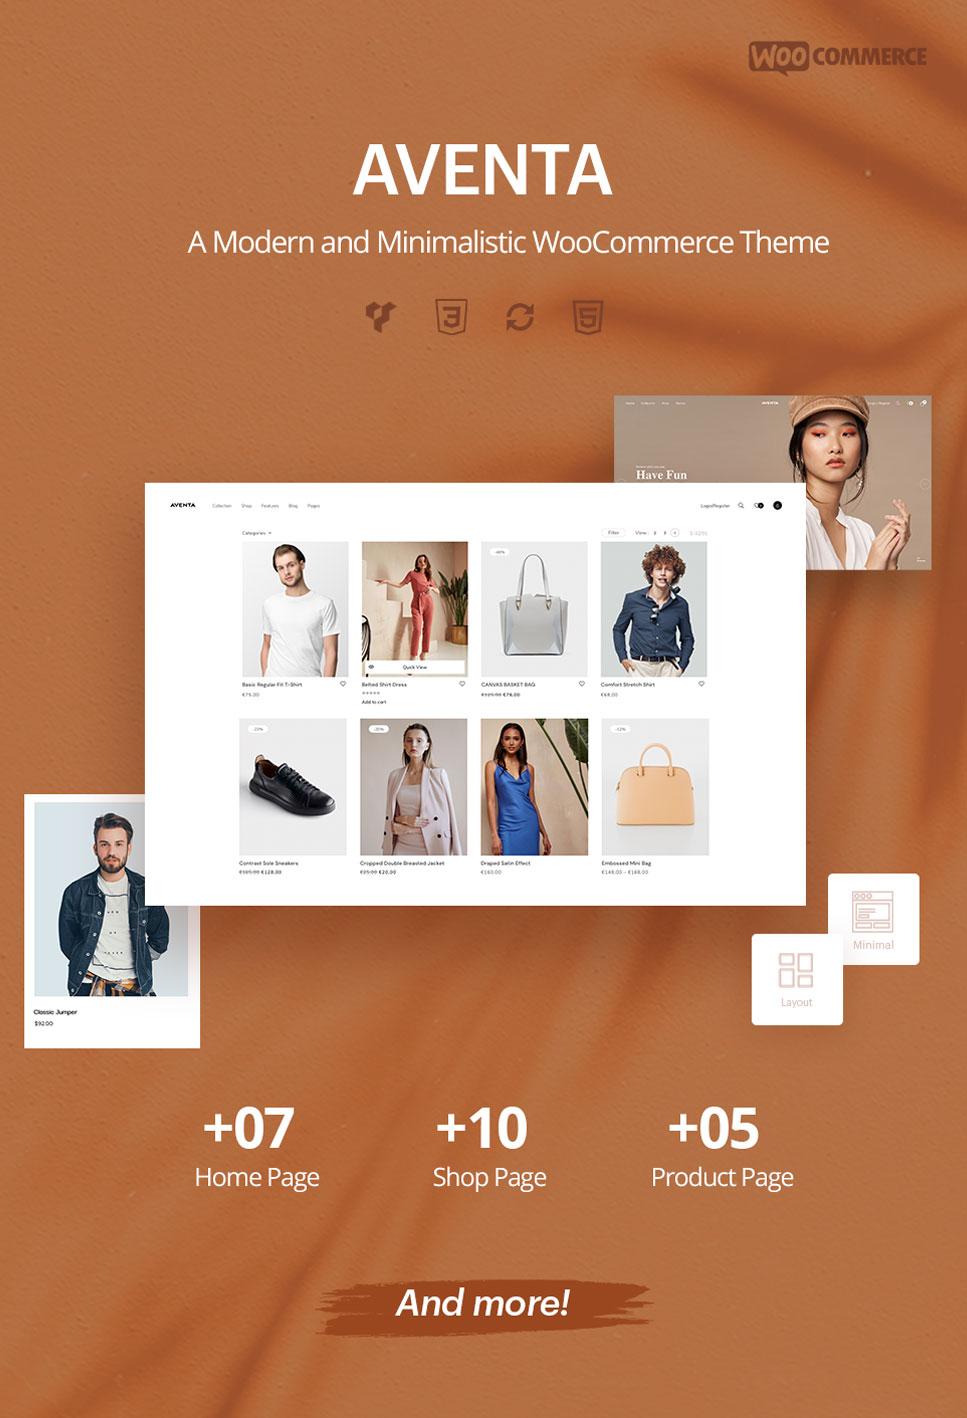 Aventa - Thème woocommerce minimal et moderne